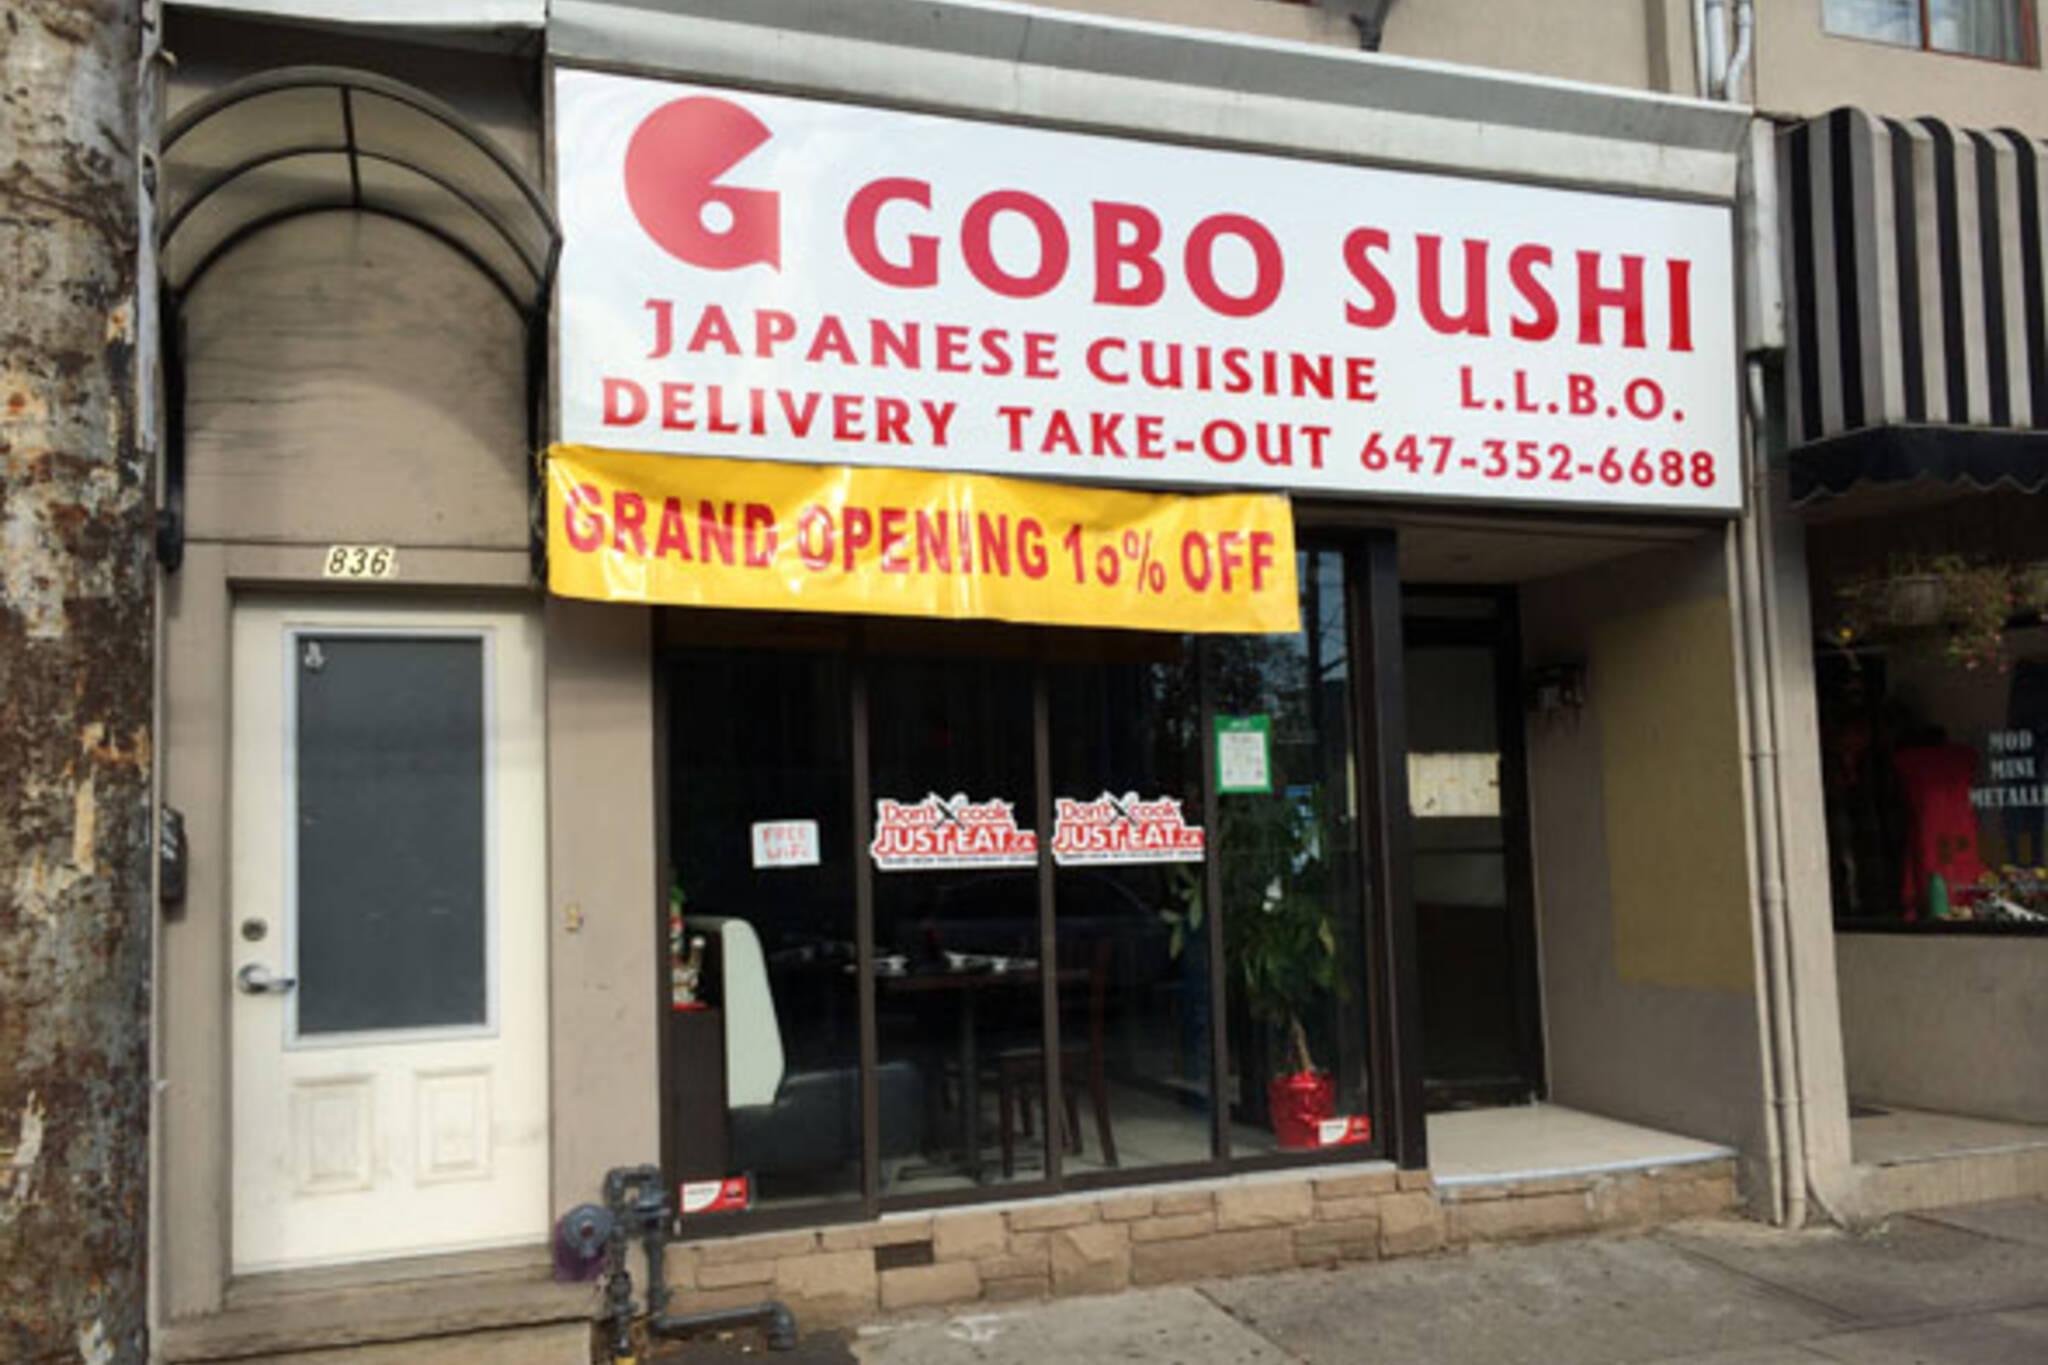 Gobo Sushi